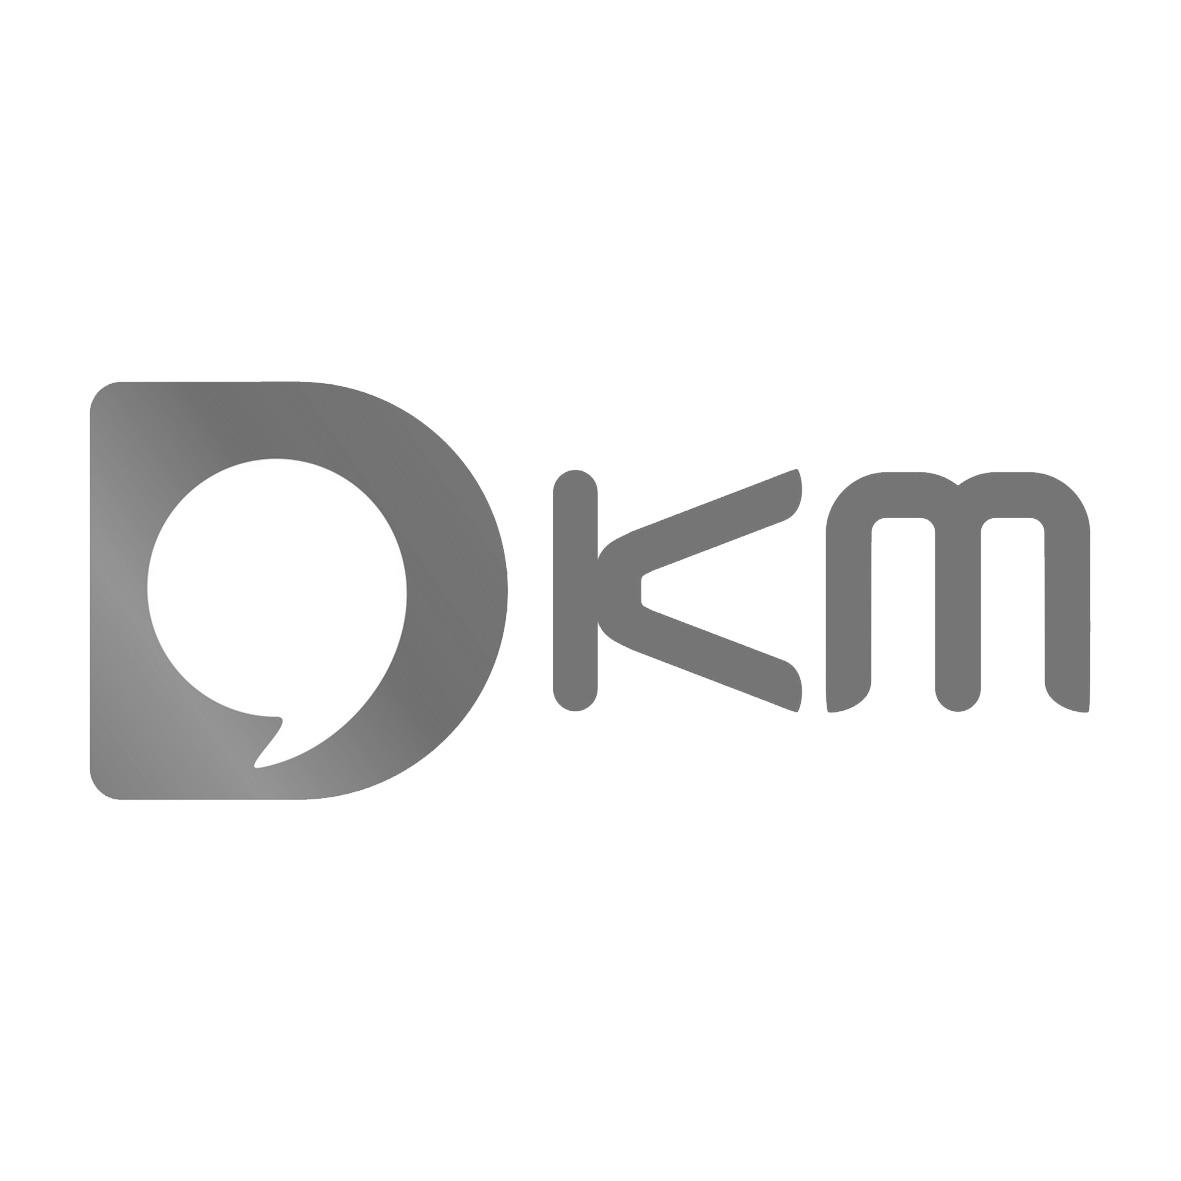 DKM 商标公告